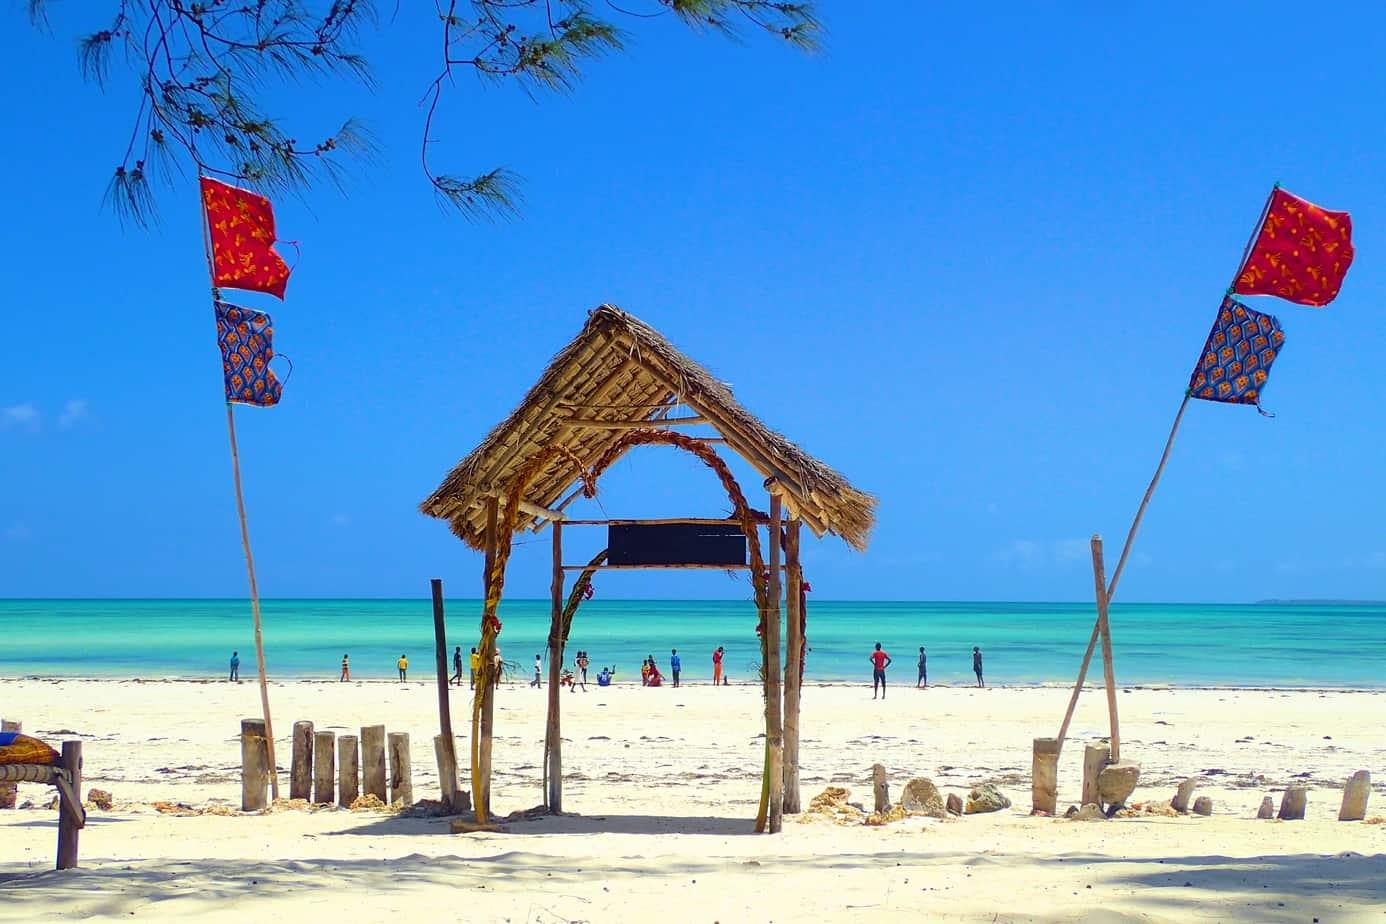 Visiting Zanzibar on a budget